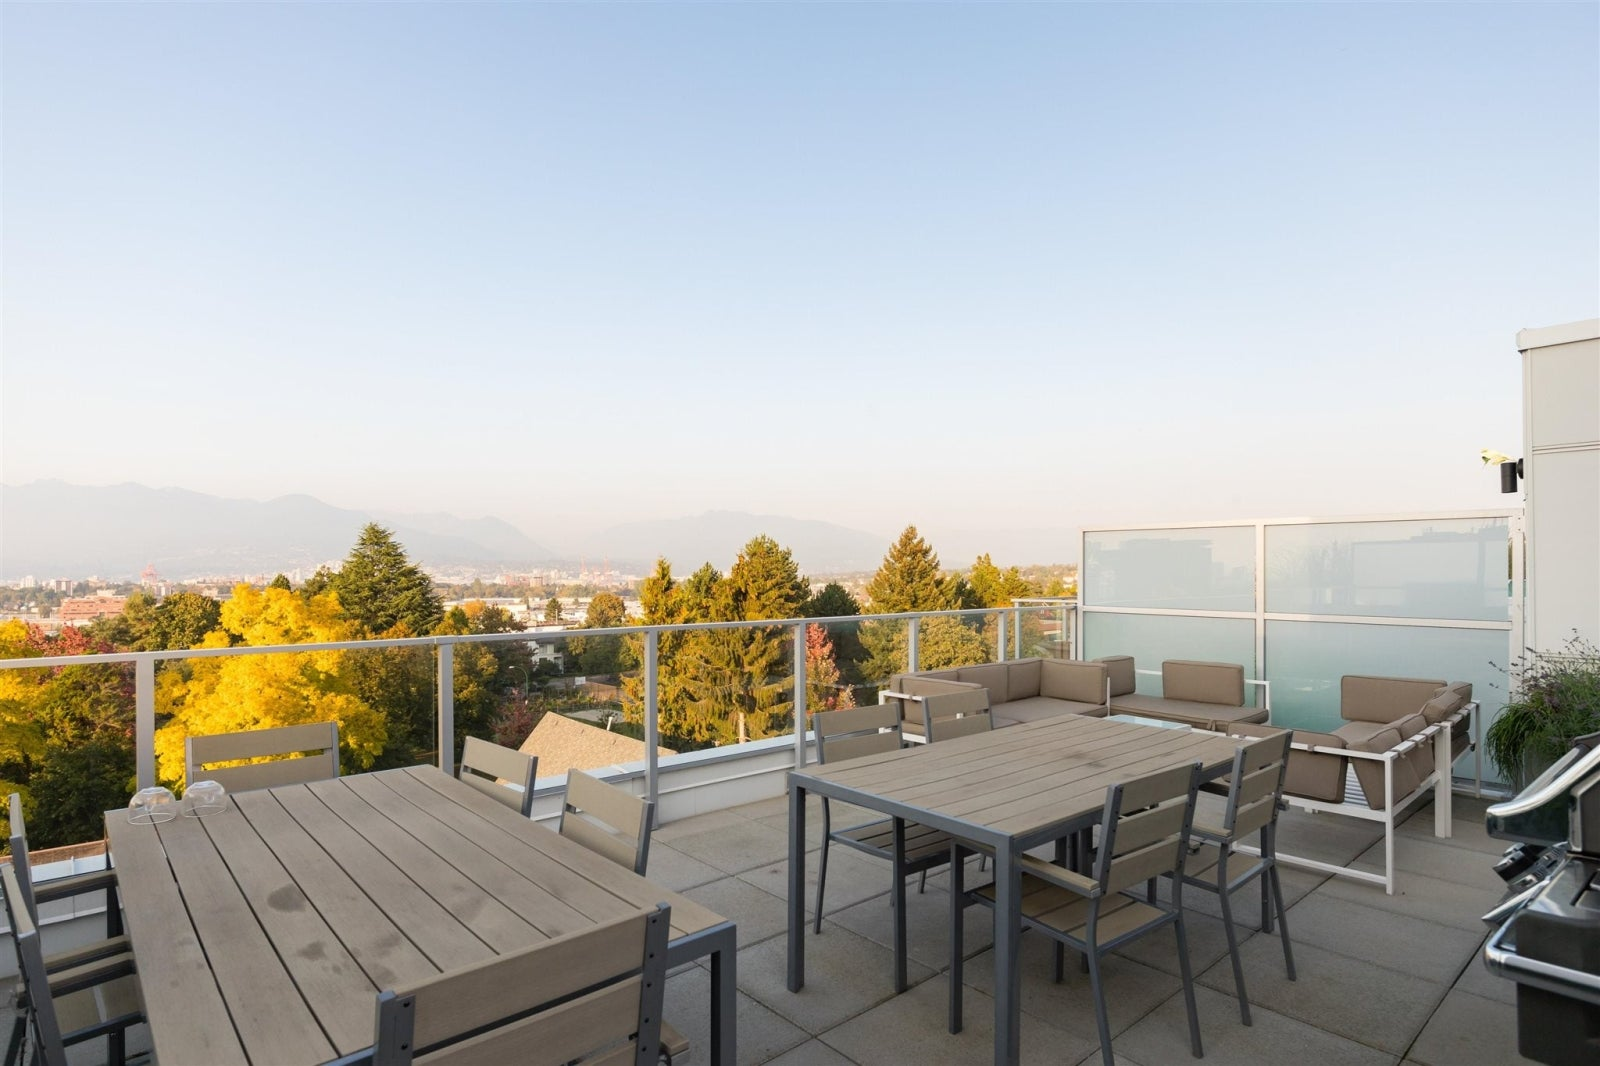 408 379 E BROADWAY AVENUE - Mount Pleasant VE Apartment/Condo for sale, 2 Bedrooms (R2599900) #27